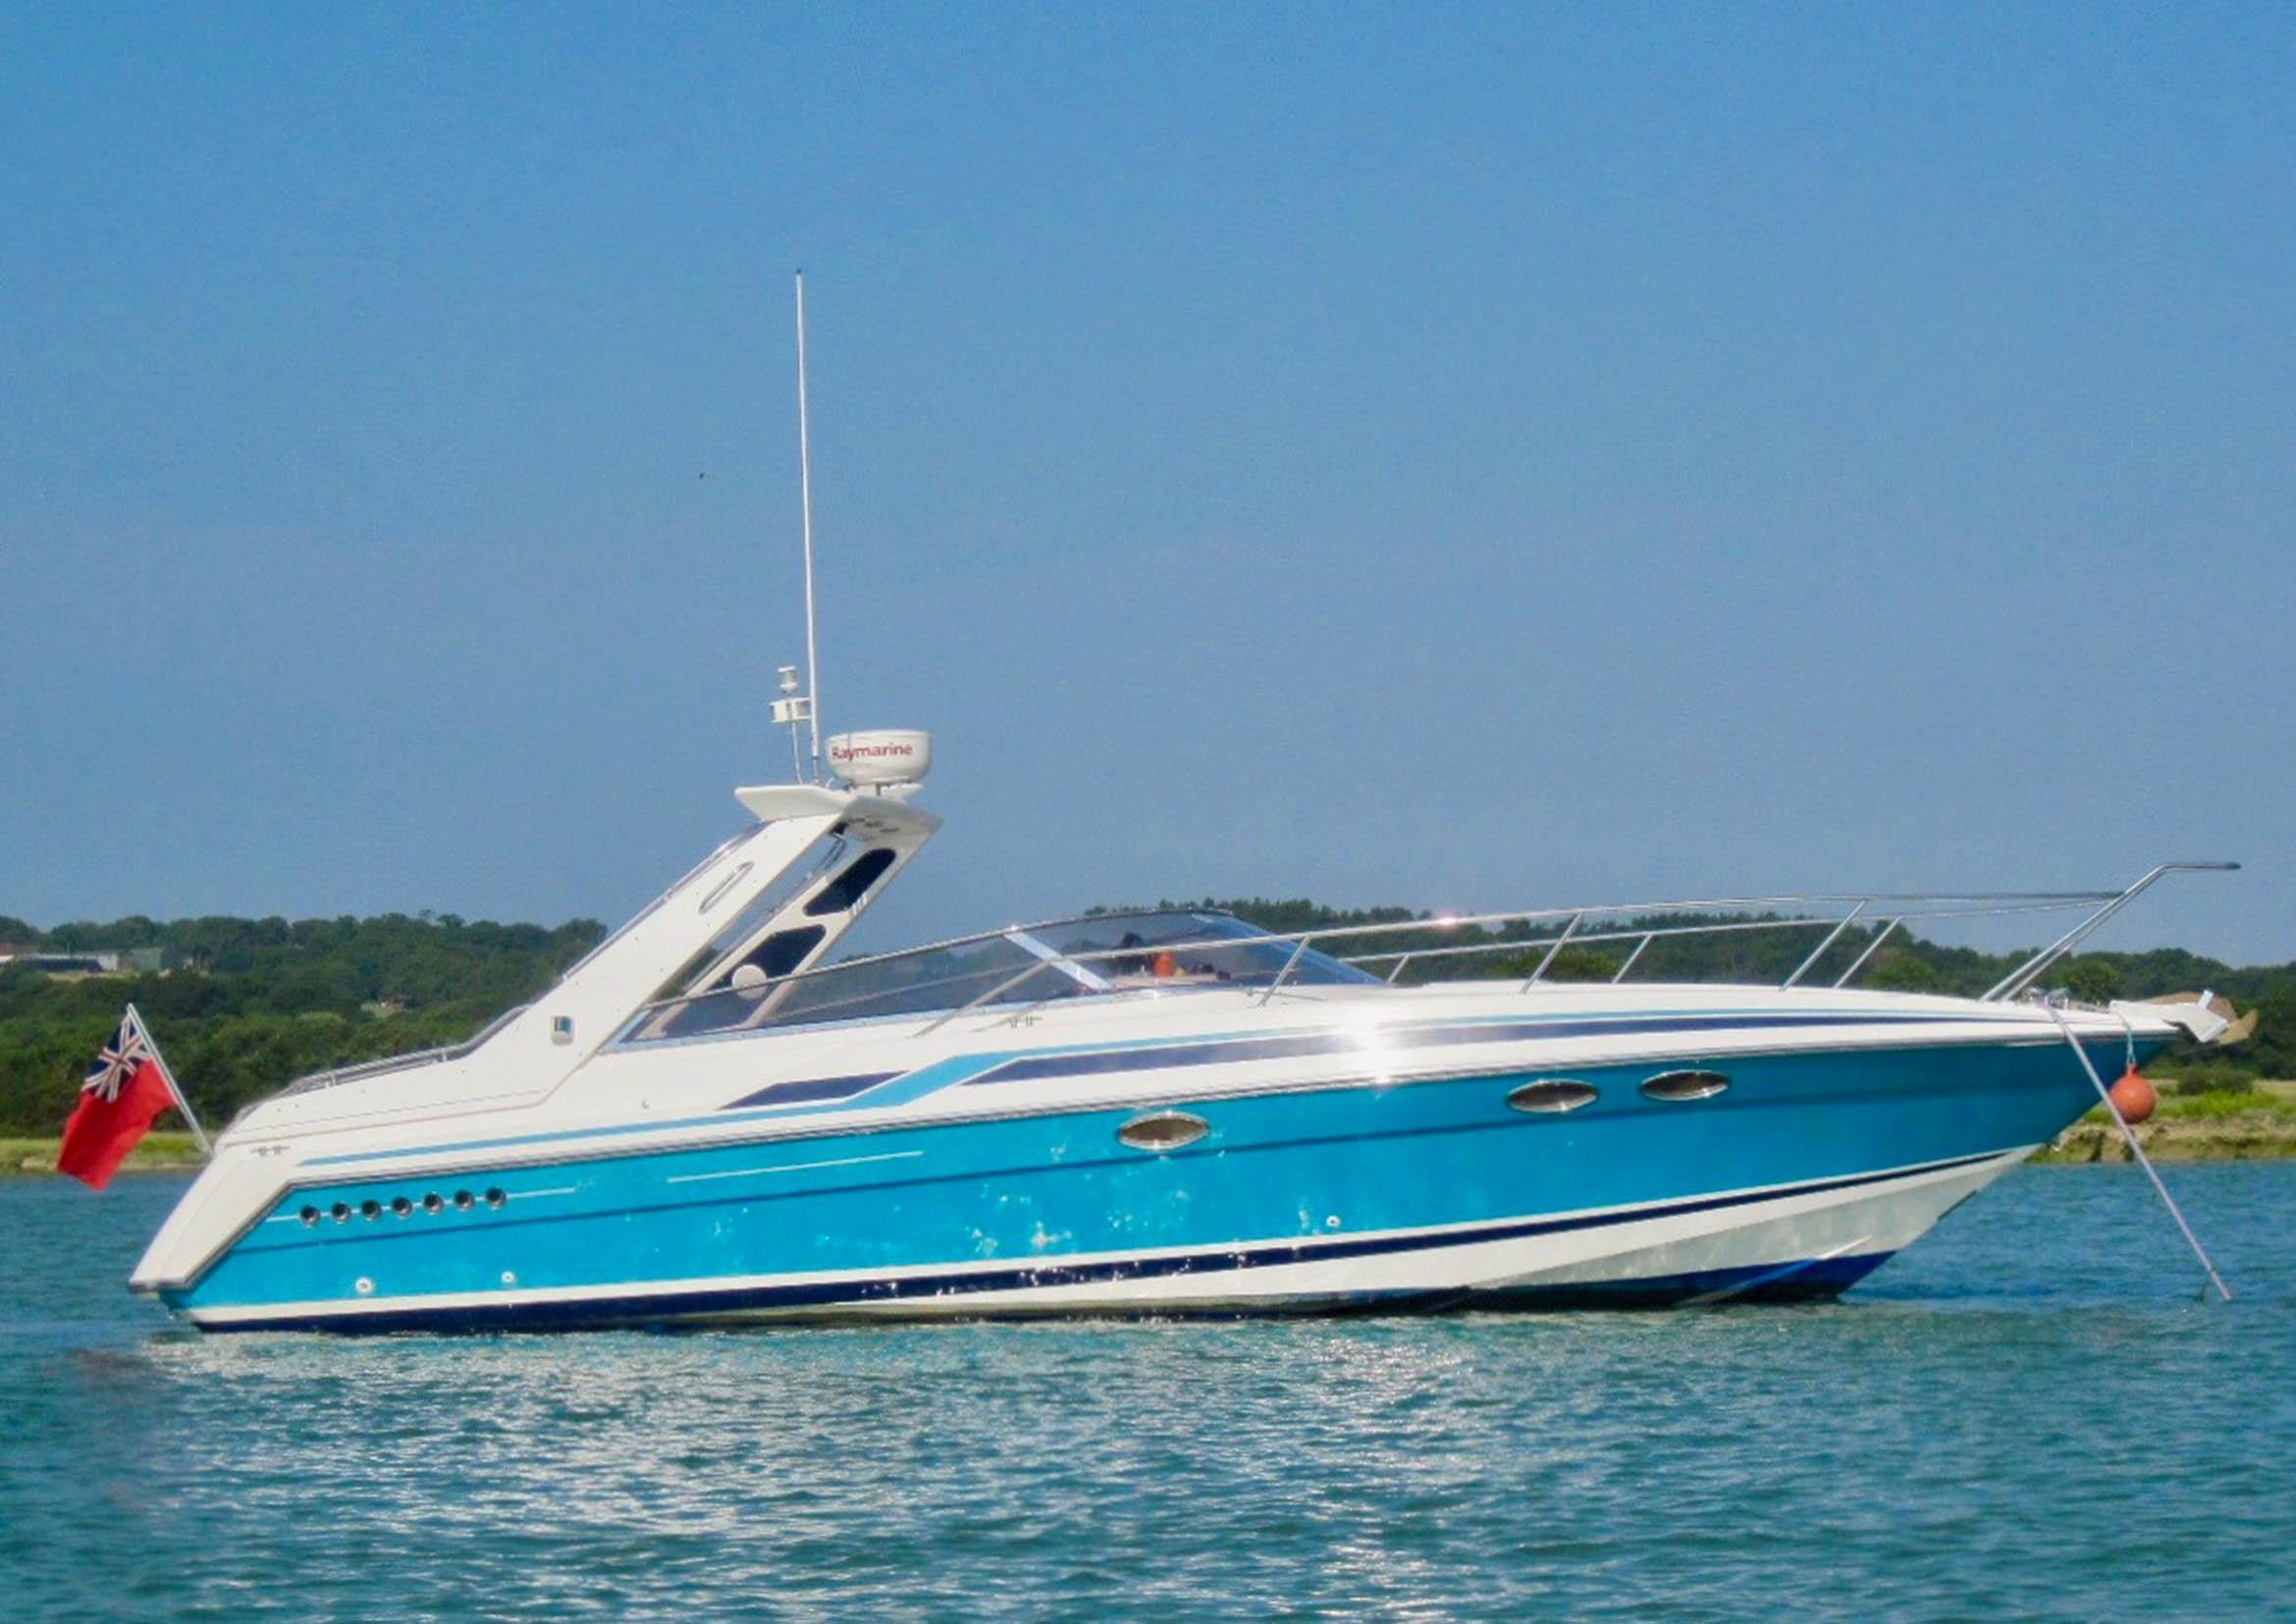 SUNDOWNER OF LYMINGTON-Portofino 32 | Sunseeker Torquay